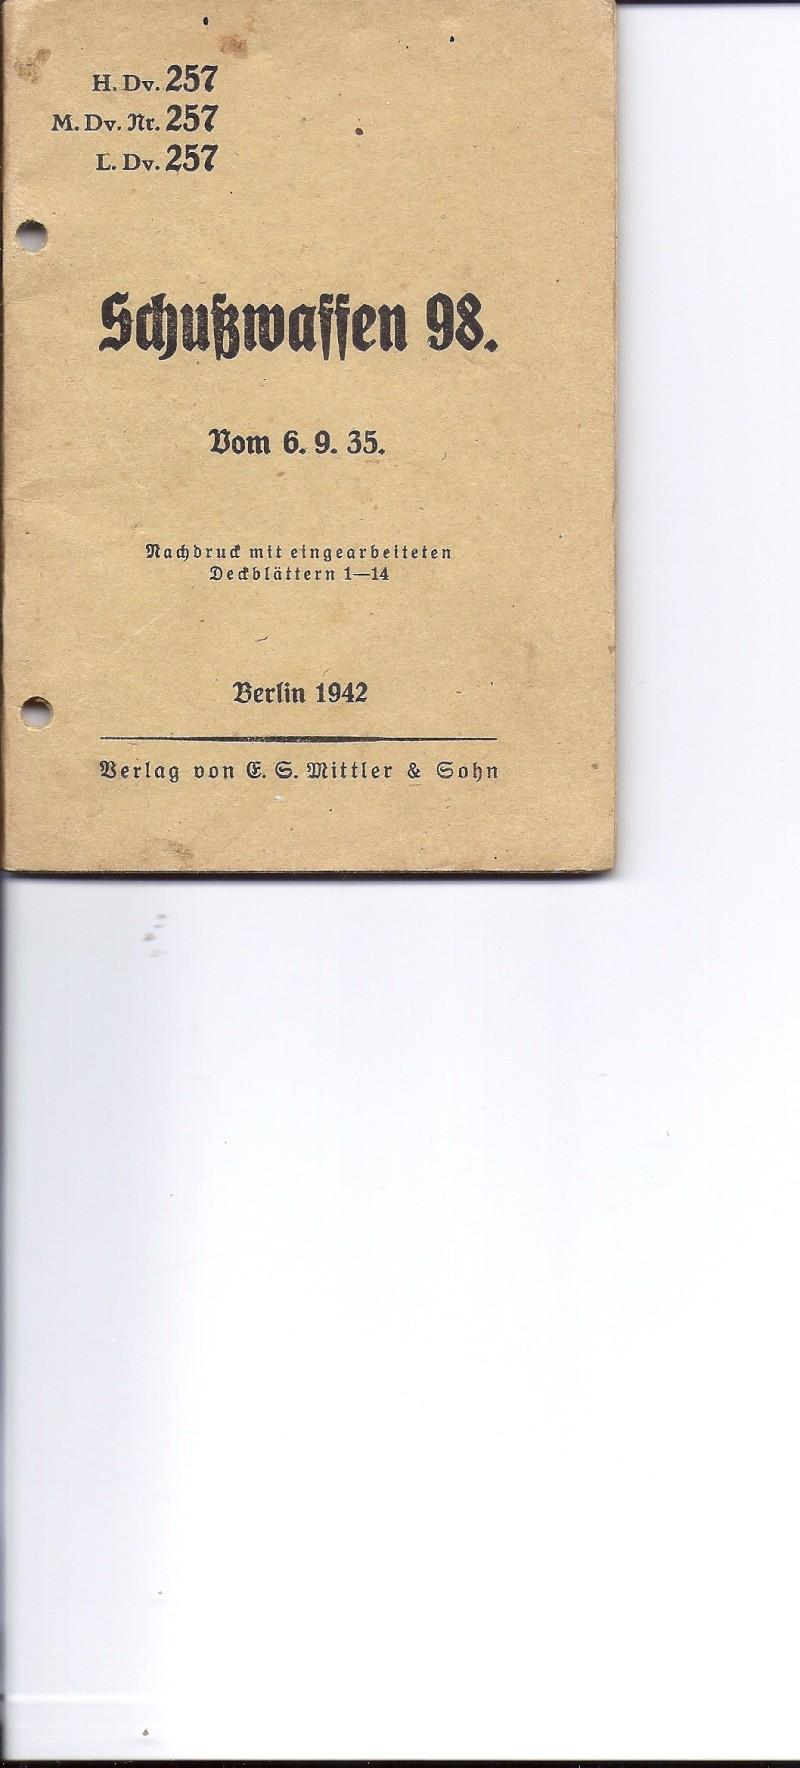 Manuel H. Dv. 257 fusil et carabine 98 Numyri21